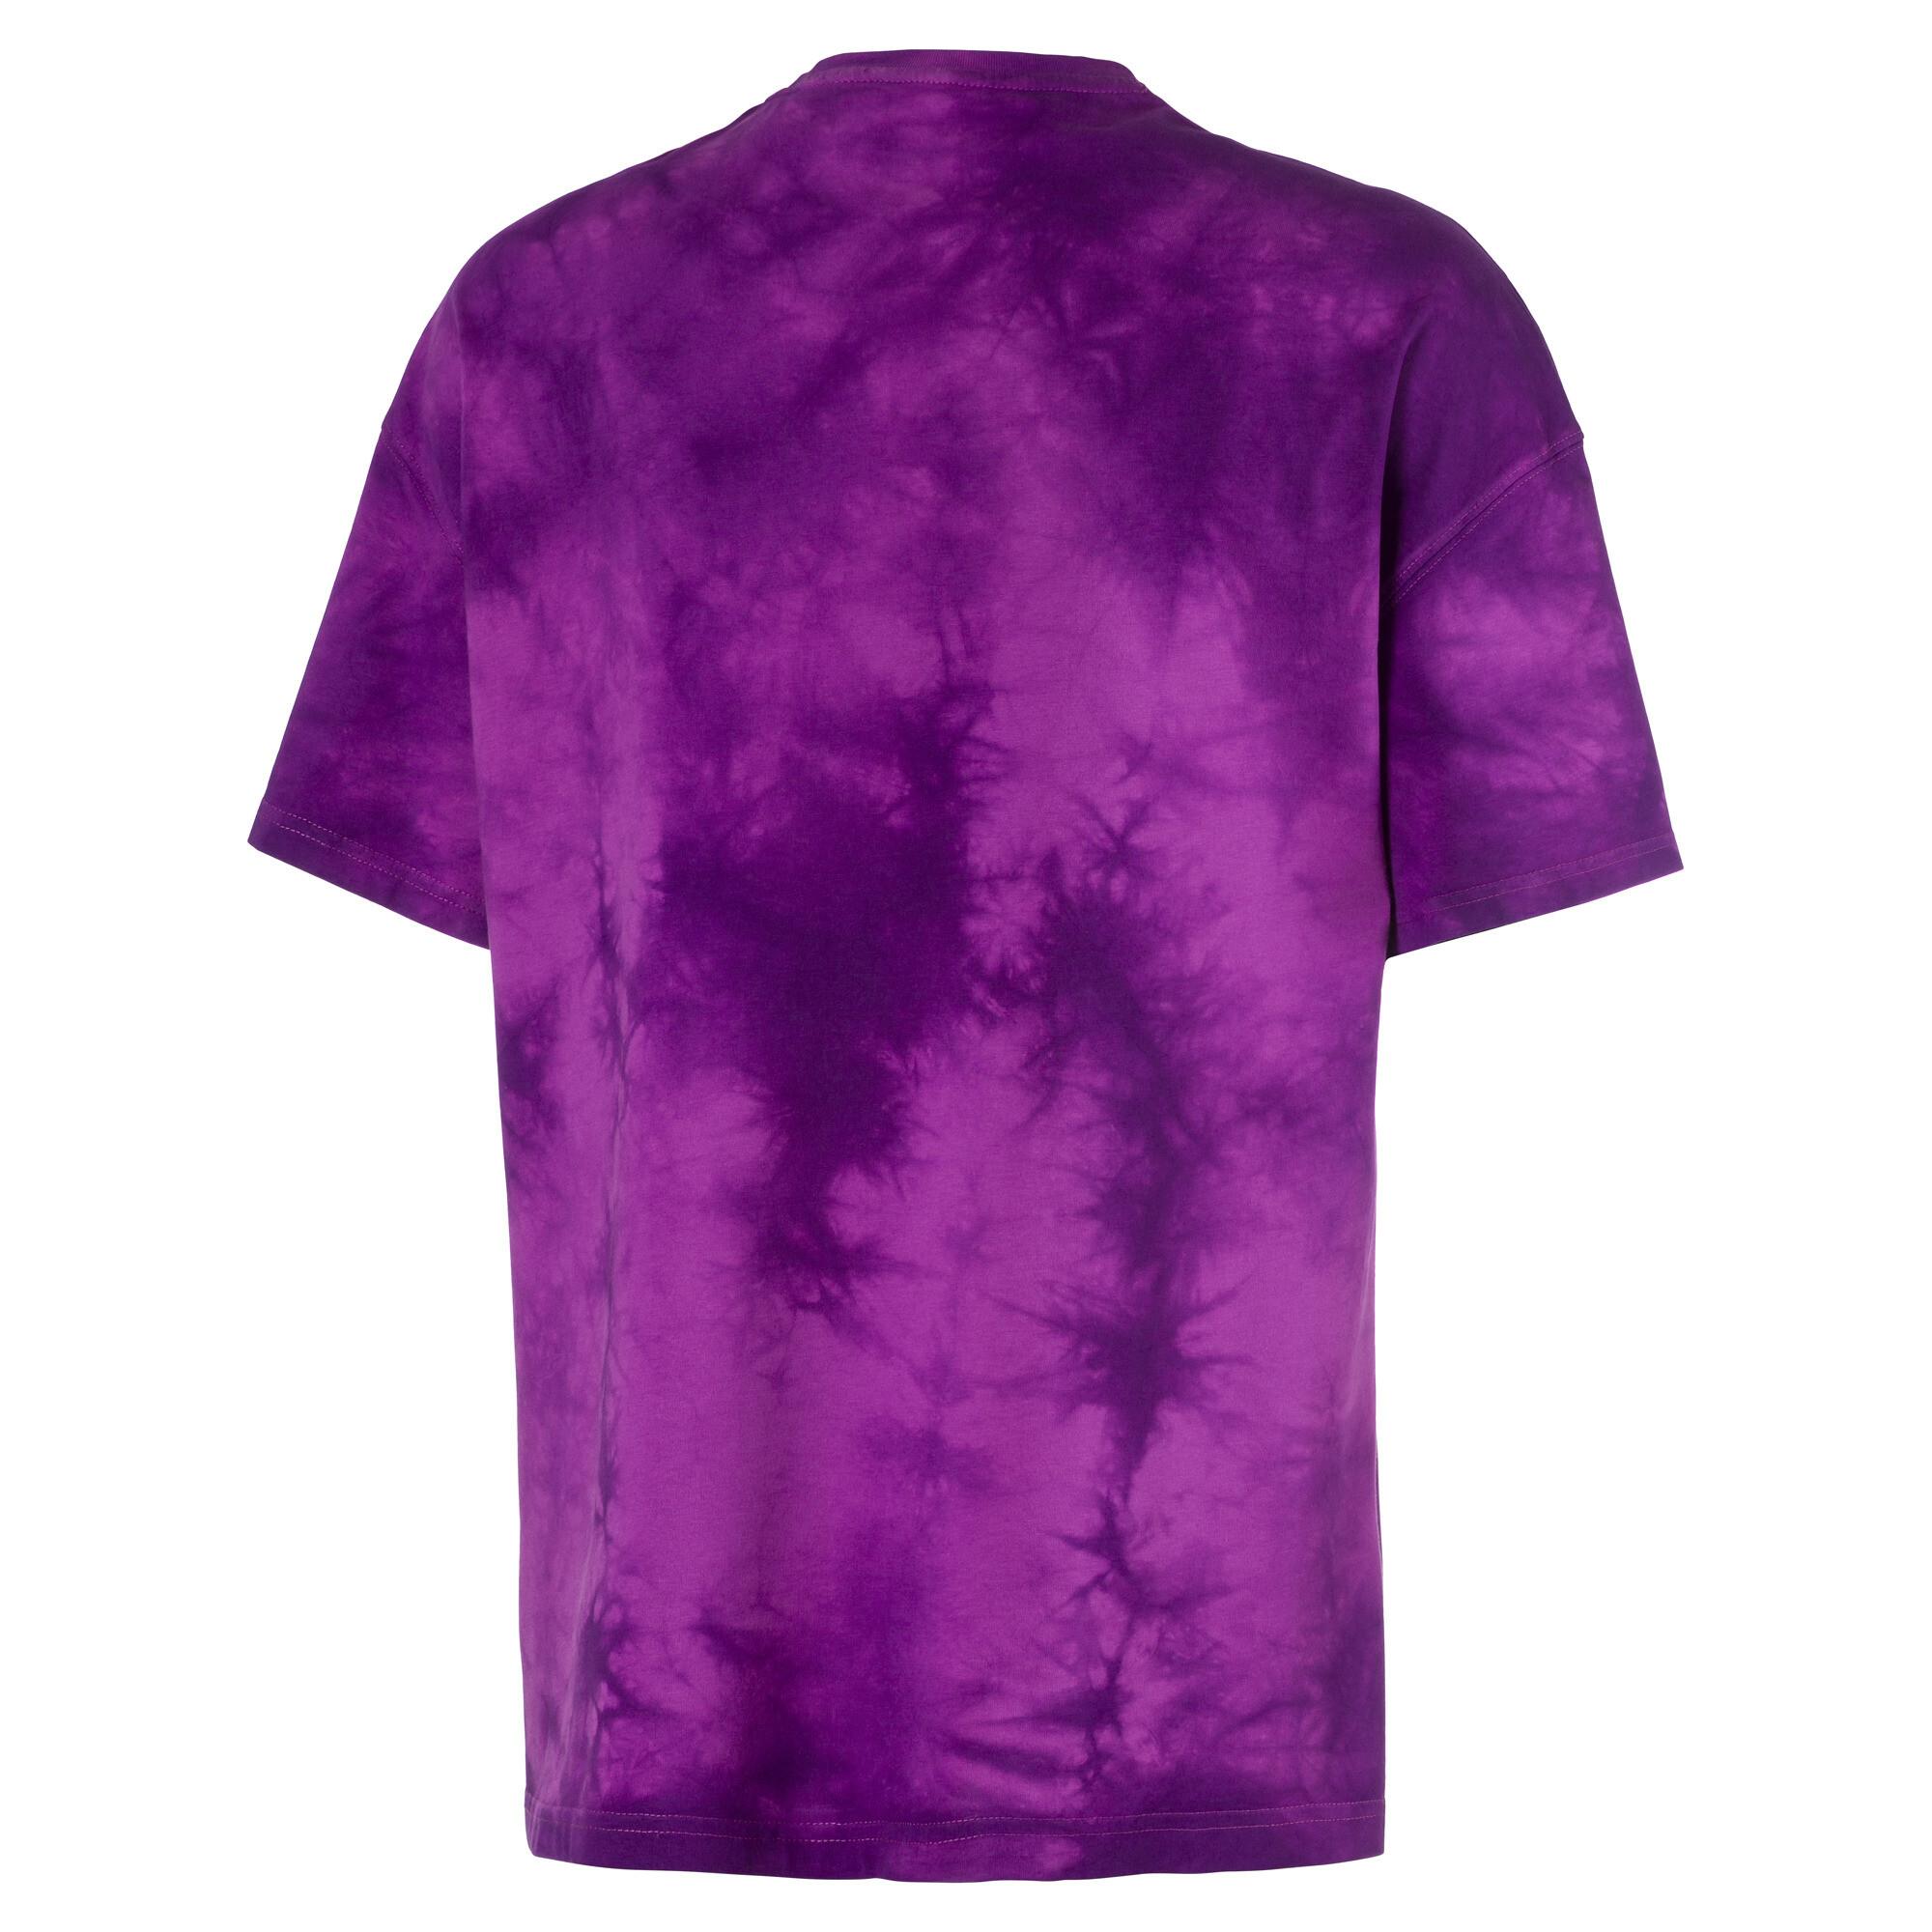 PUMA-Boxy-Herren-T-Shirt-Maenner-T-Shirt-Neu Indexbild 13